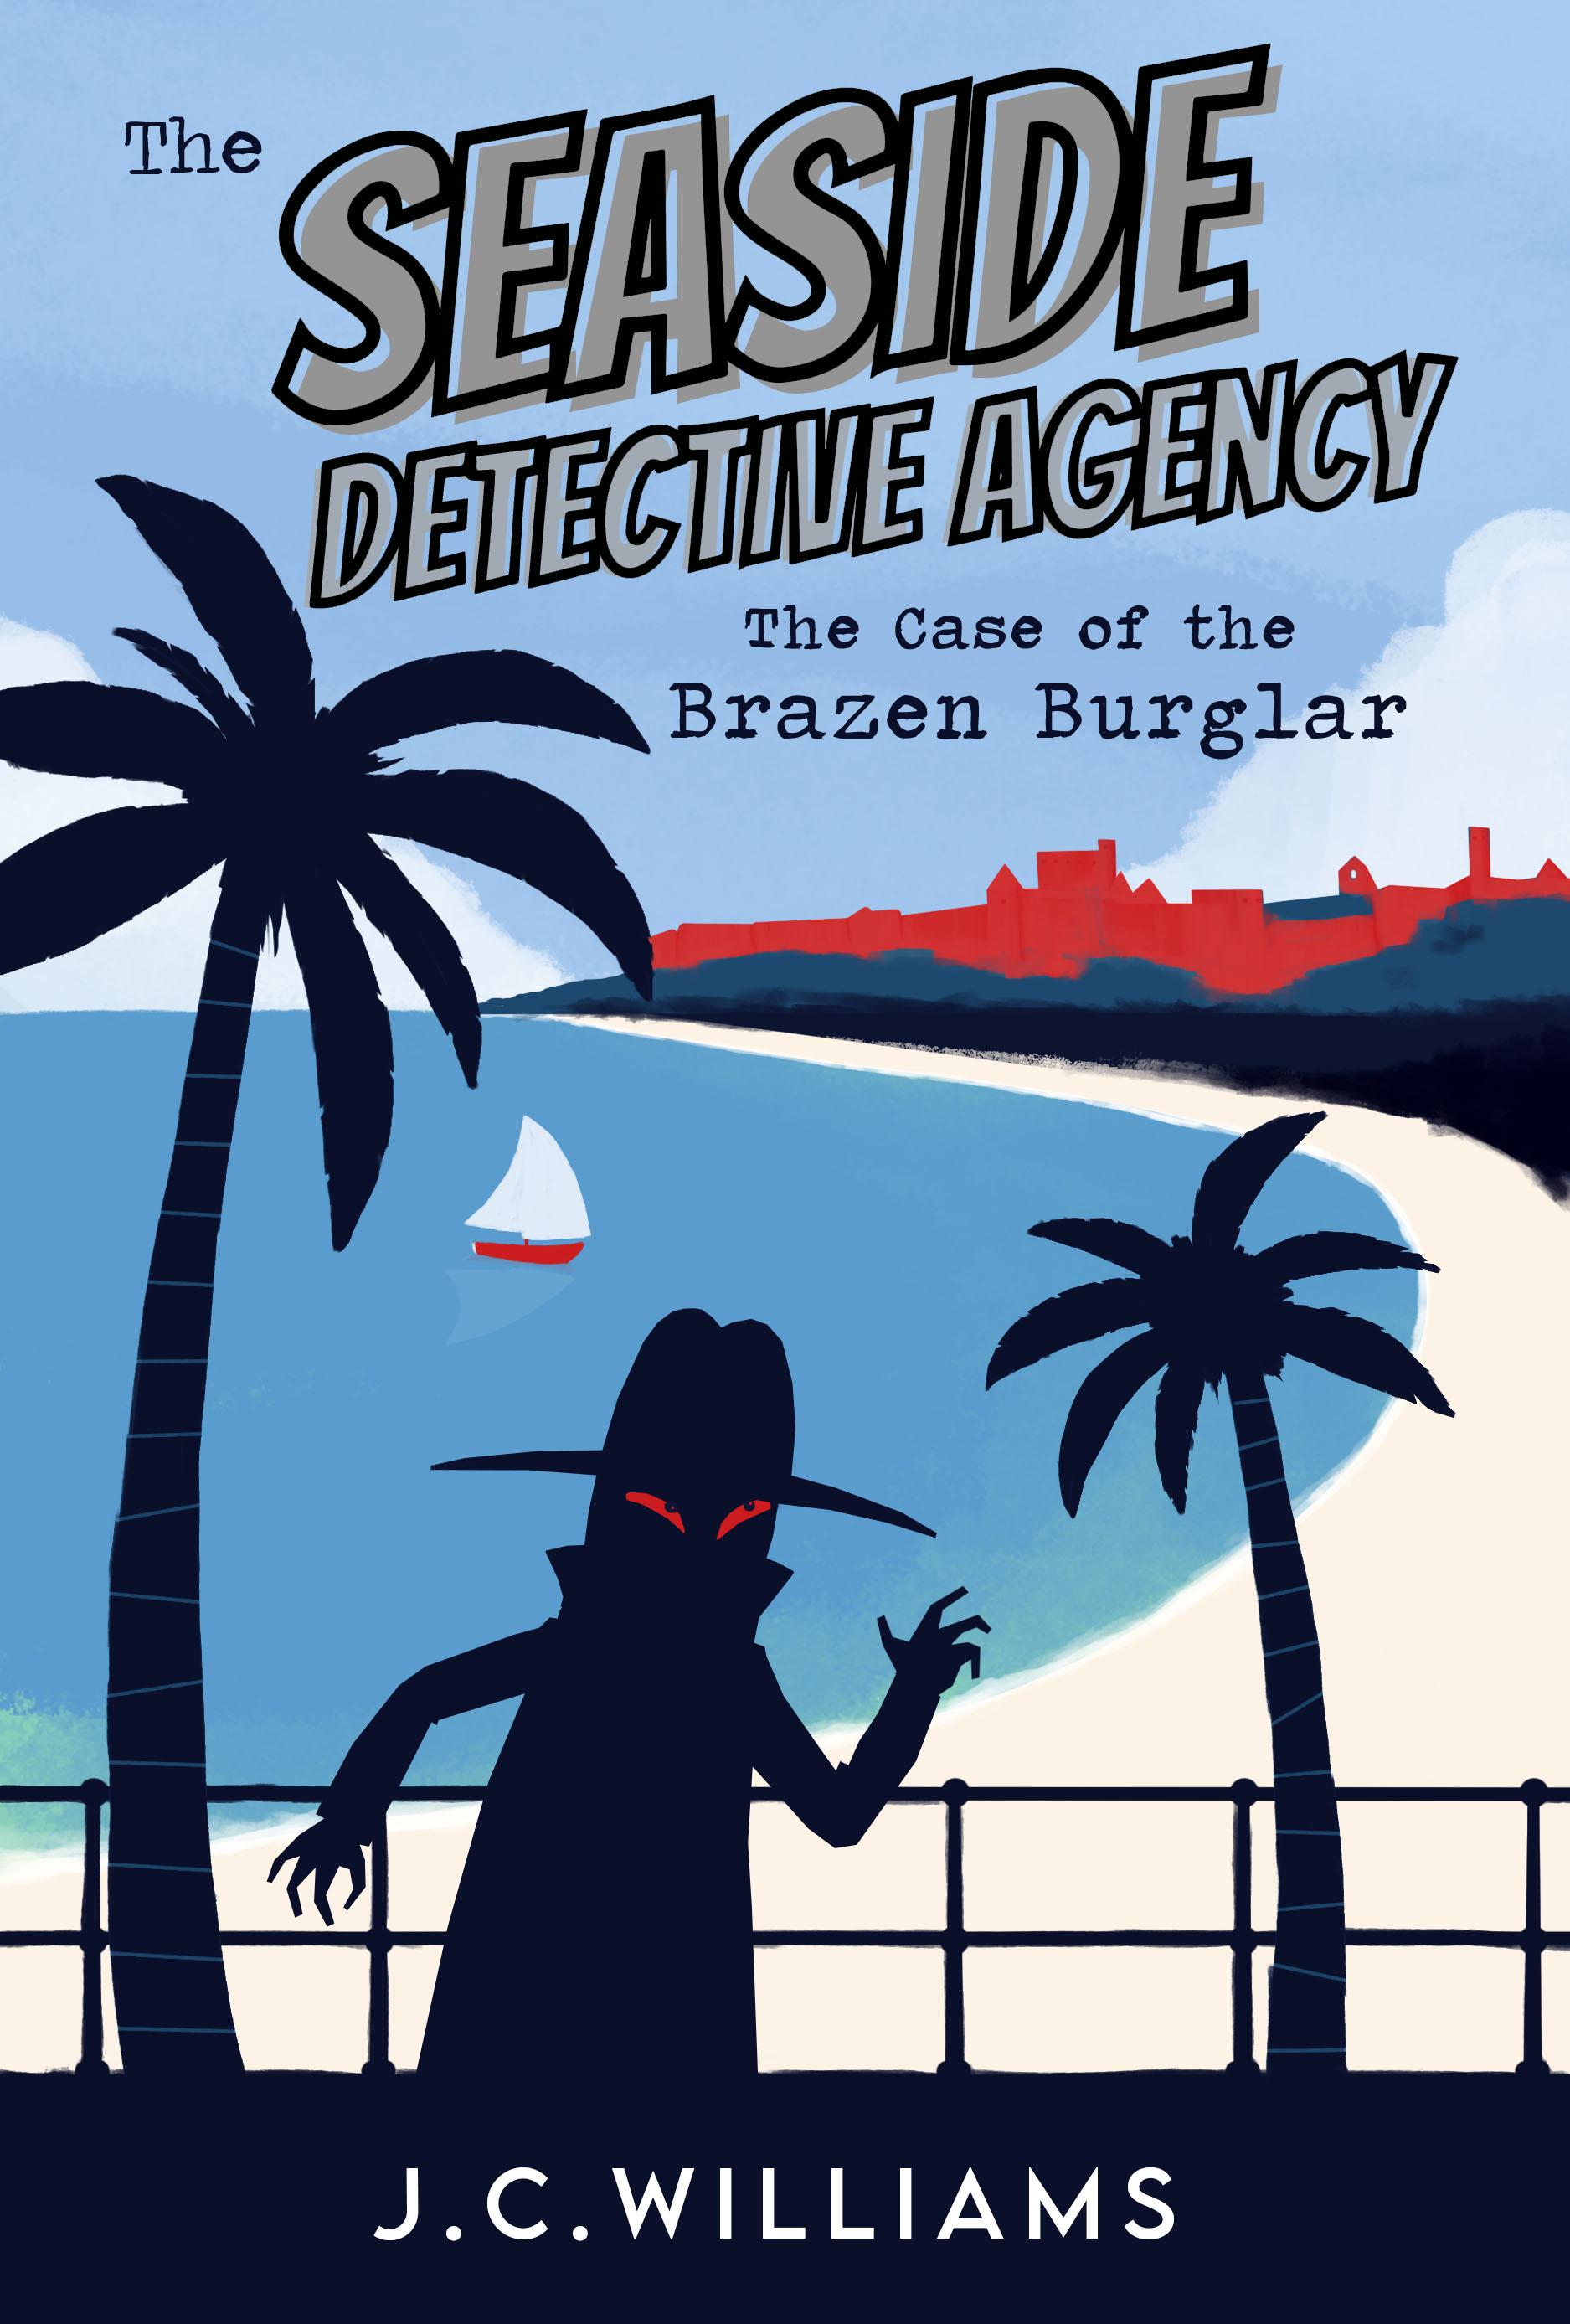 The Seaside Detective Agency - The Case of the Brazen Burglar (#2 Isle of Man Cozy Mystery series)